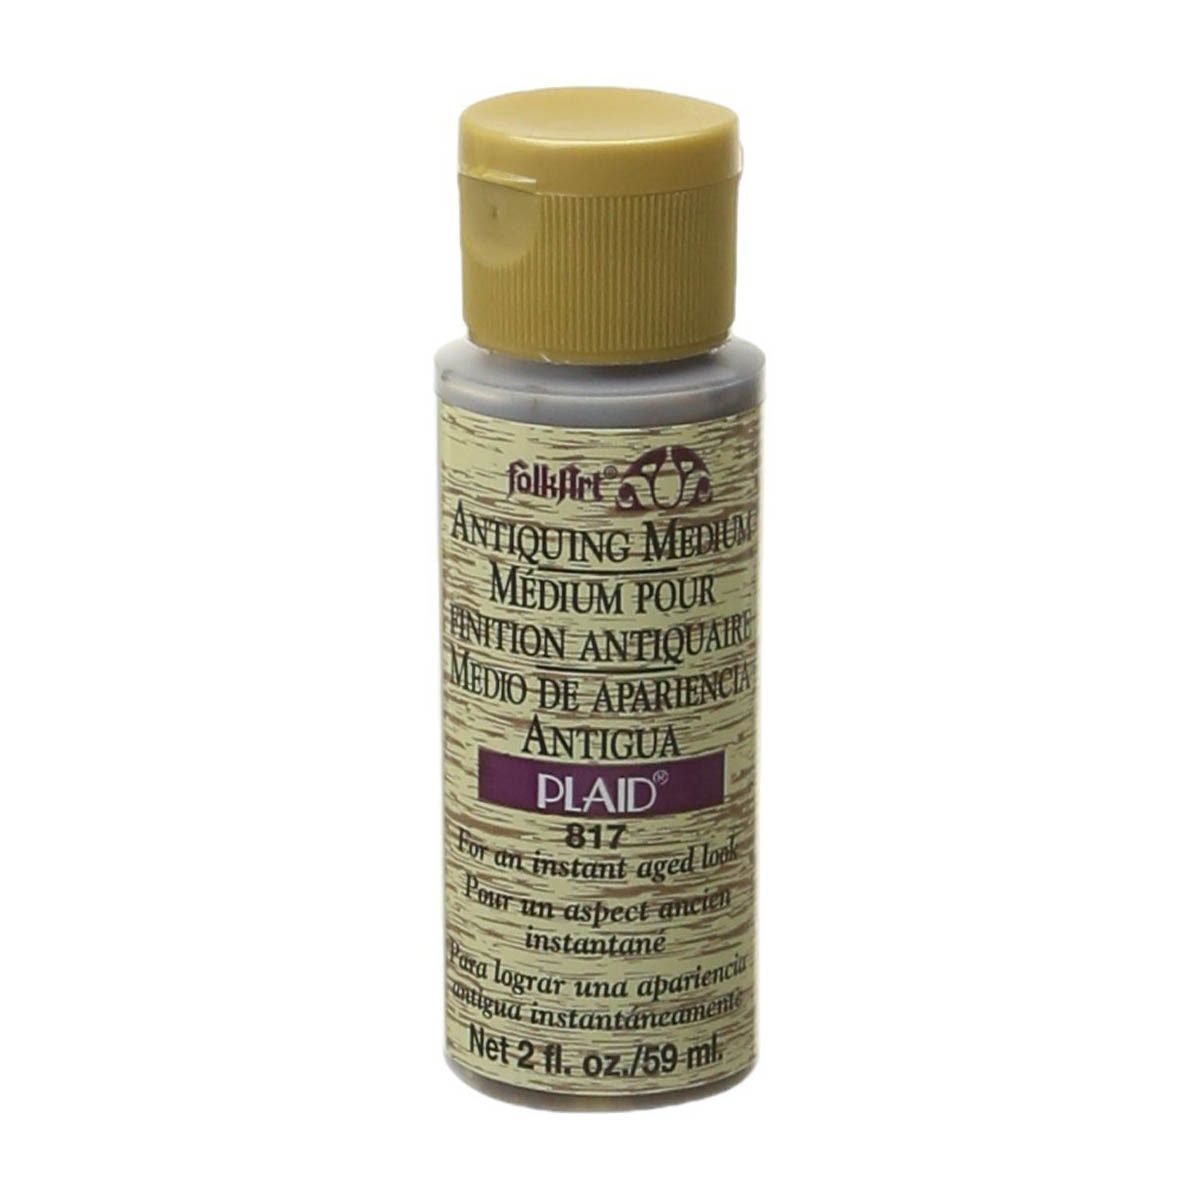 FolkArt ® Mediums - Antiquing Medium - Woodn' Bucket Brown, 2 oz. - 817